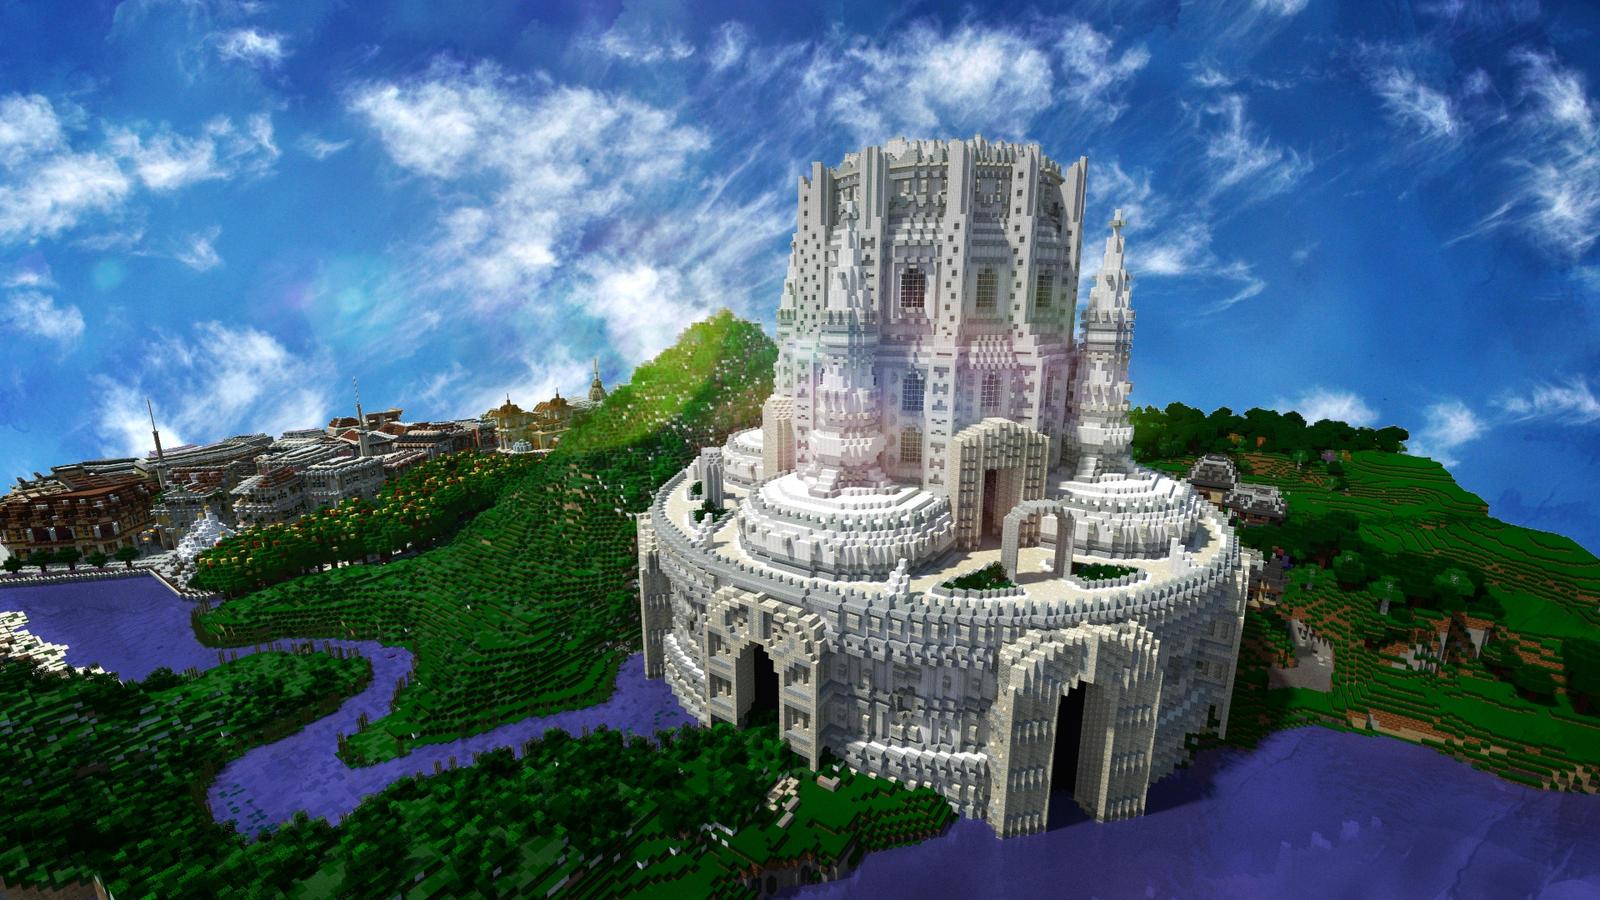 Minecraft White Castle Tower by skysworld on DeviantArt